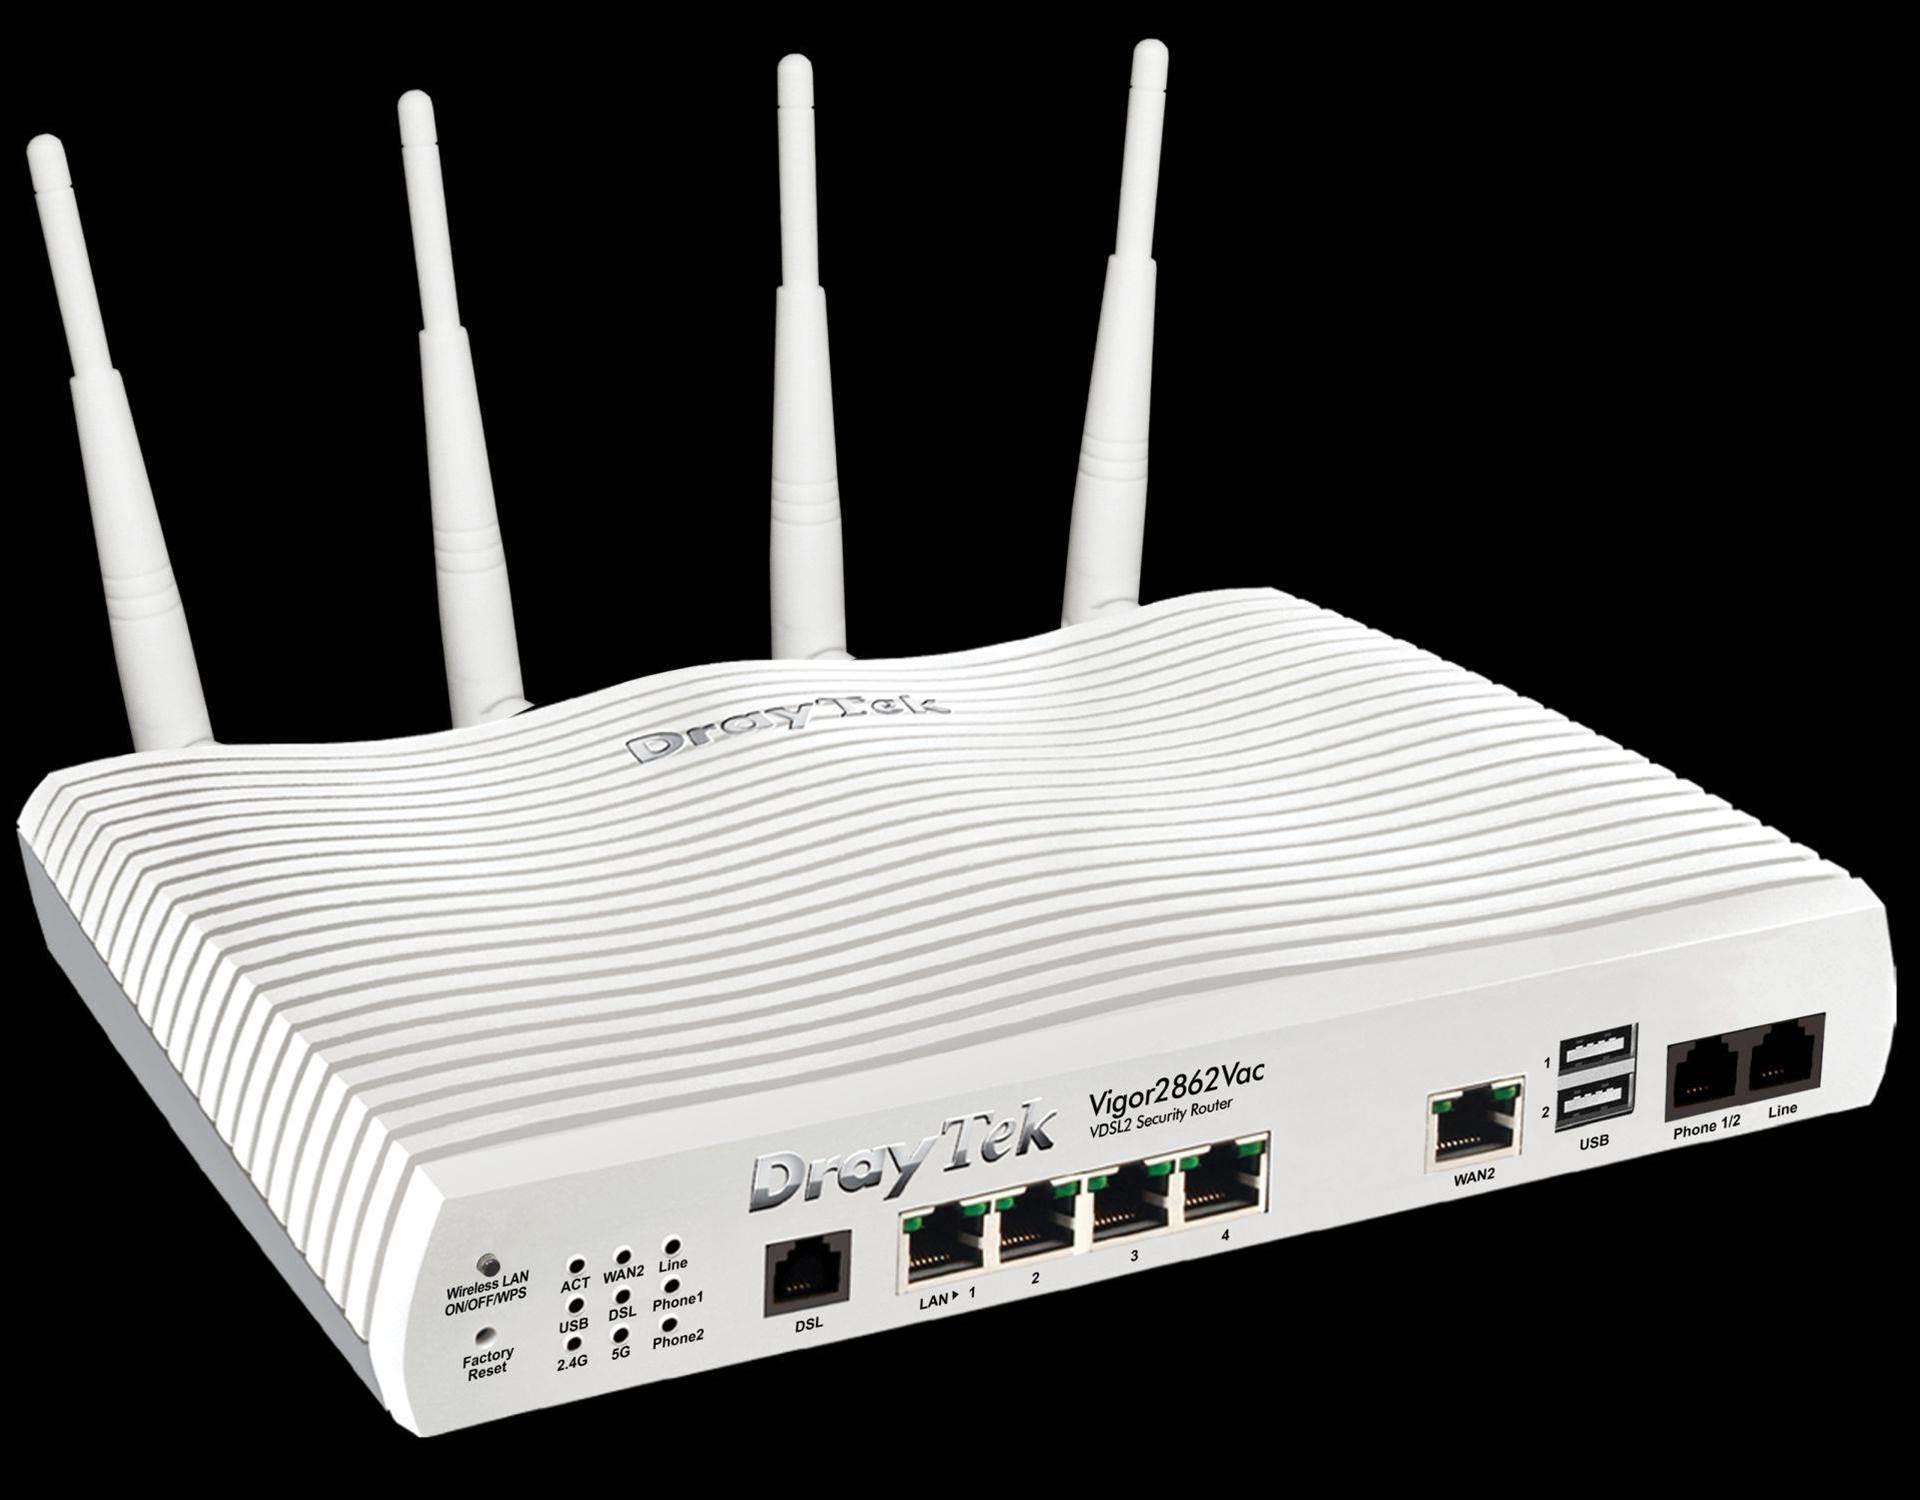 Review: Draytek Vigor2862Vac VDSL2 Wi-Fi VoIP Router